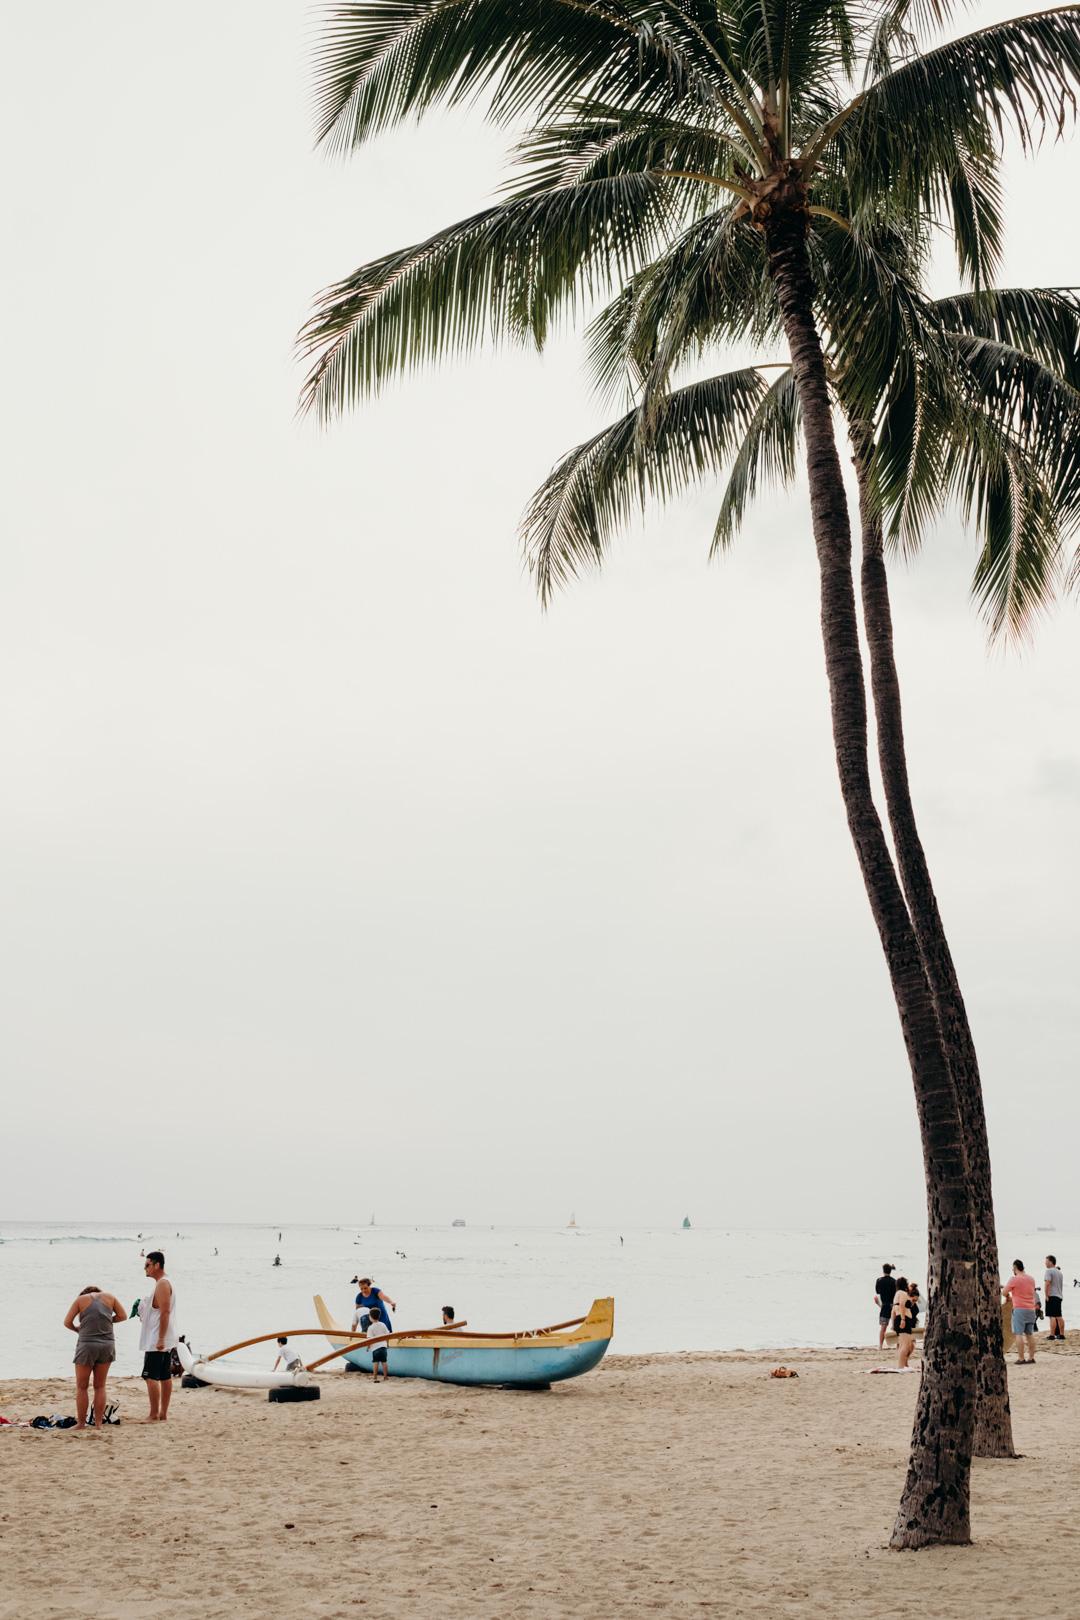 VisitHonolulu_WaikikiBeach_LaylowHotel_AliHapperPhotos_9.jpg